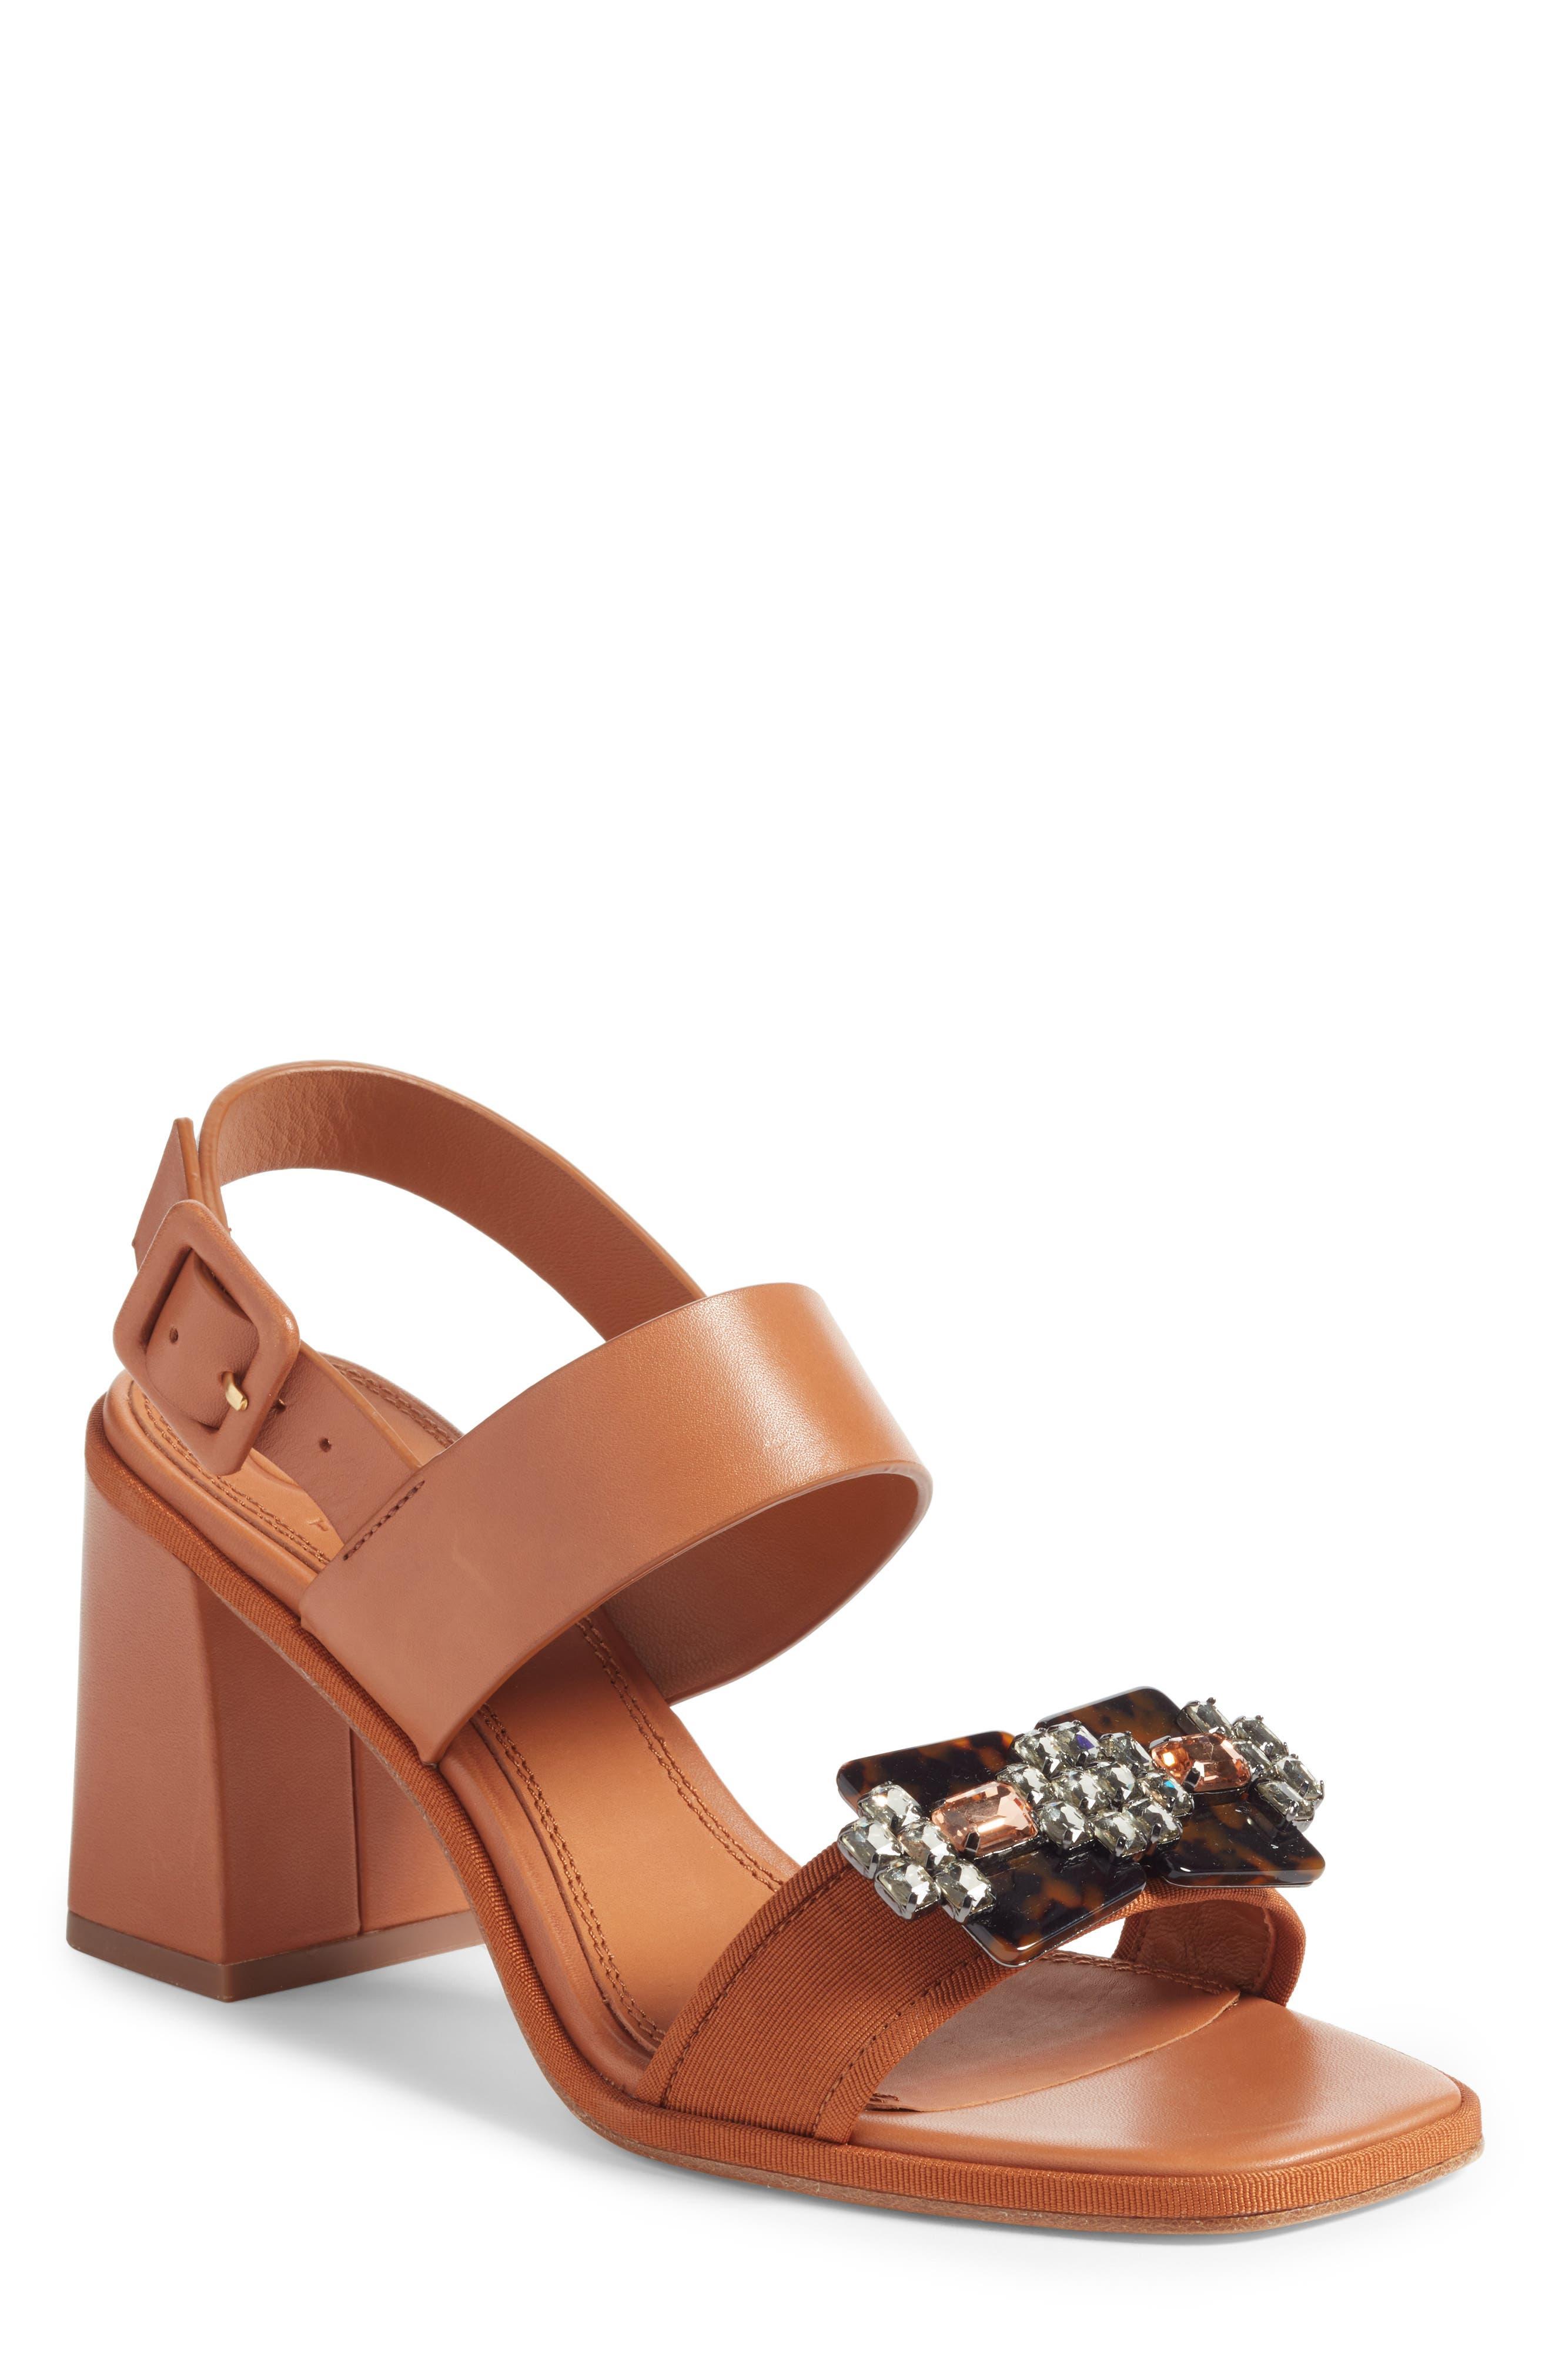 Delaney Embellished Double Strap Sandal,                             Main thumbnail 1, color,                             Tan/ Tan